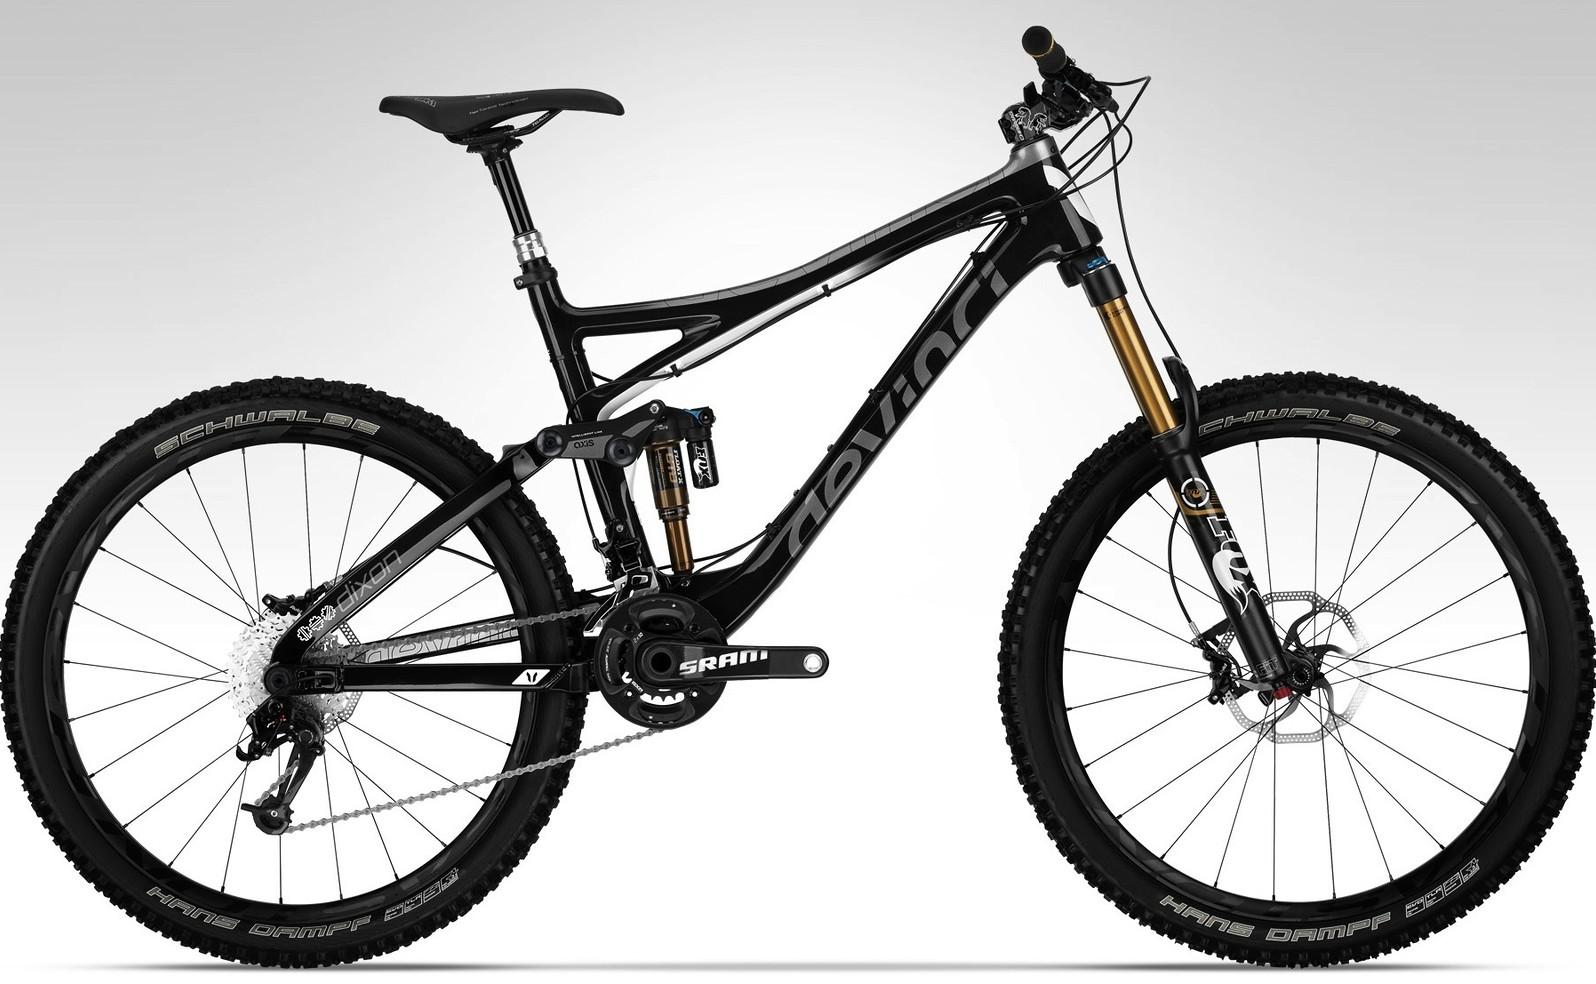 Devinci DIXON CARBON RR 1X11 bike